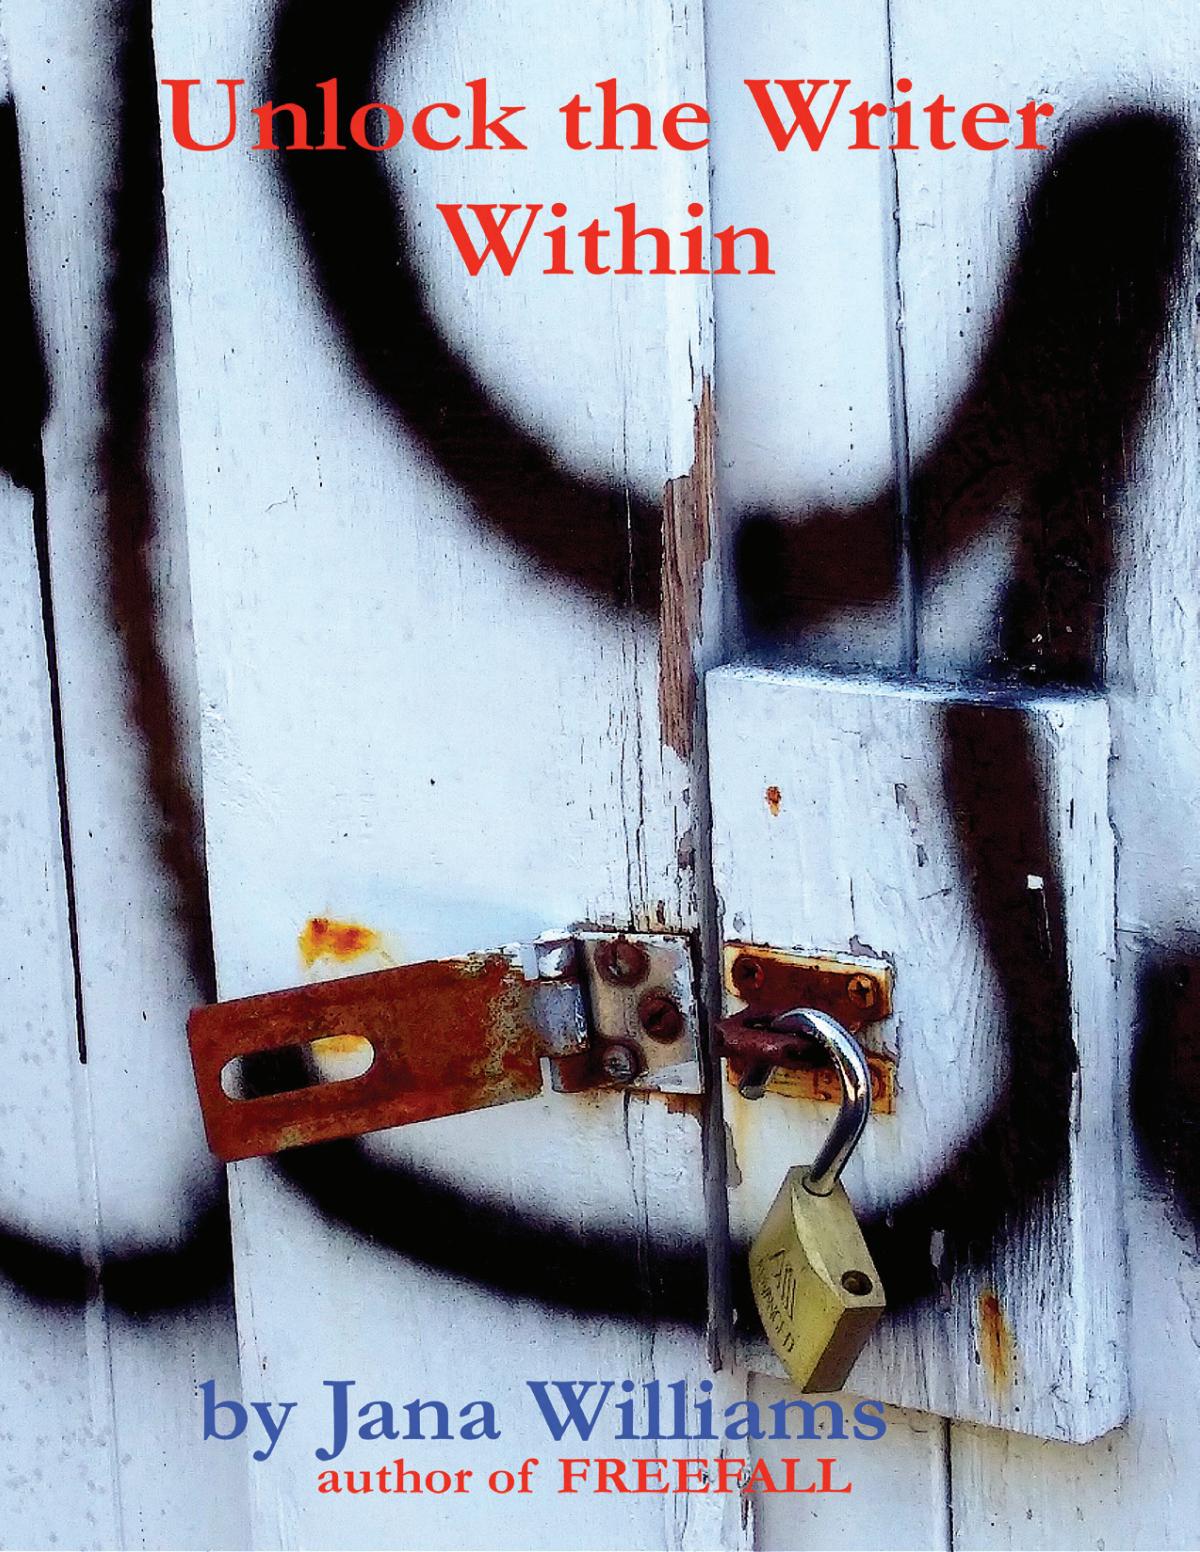 Unlocking the Writer Within